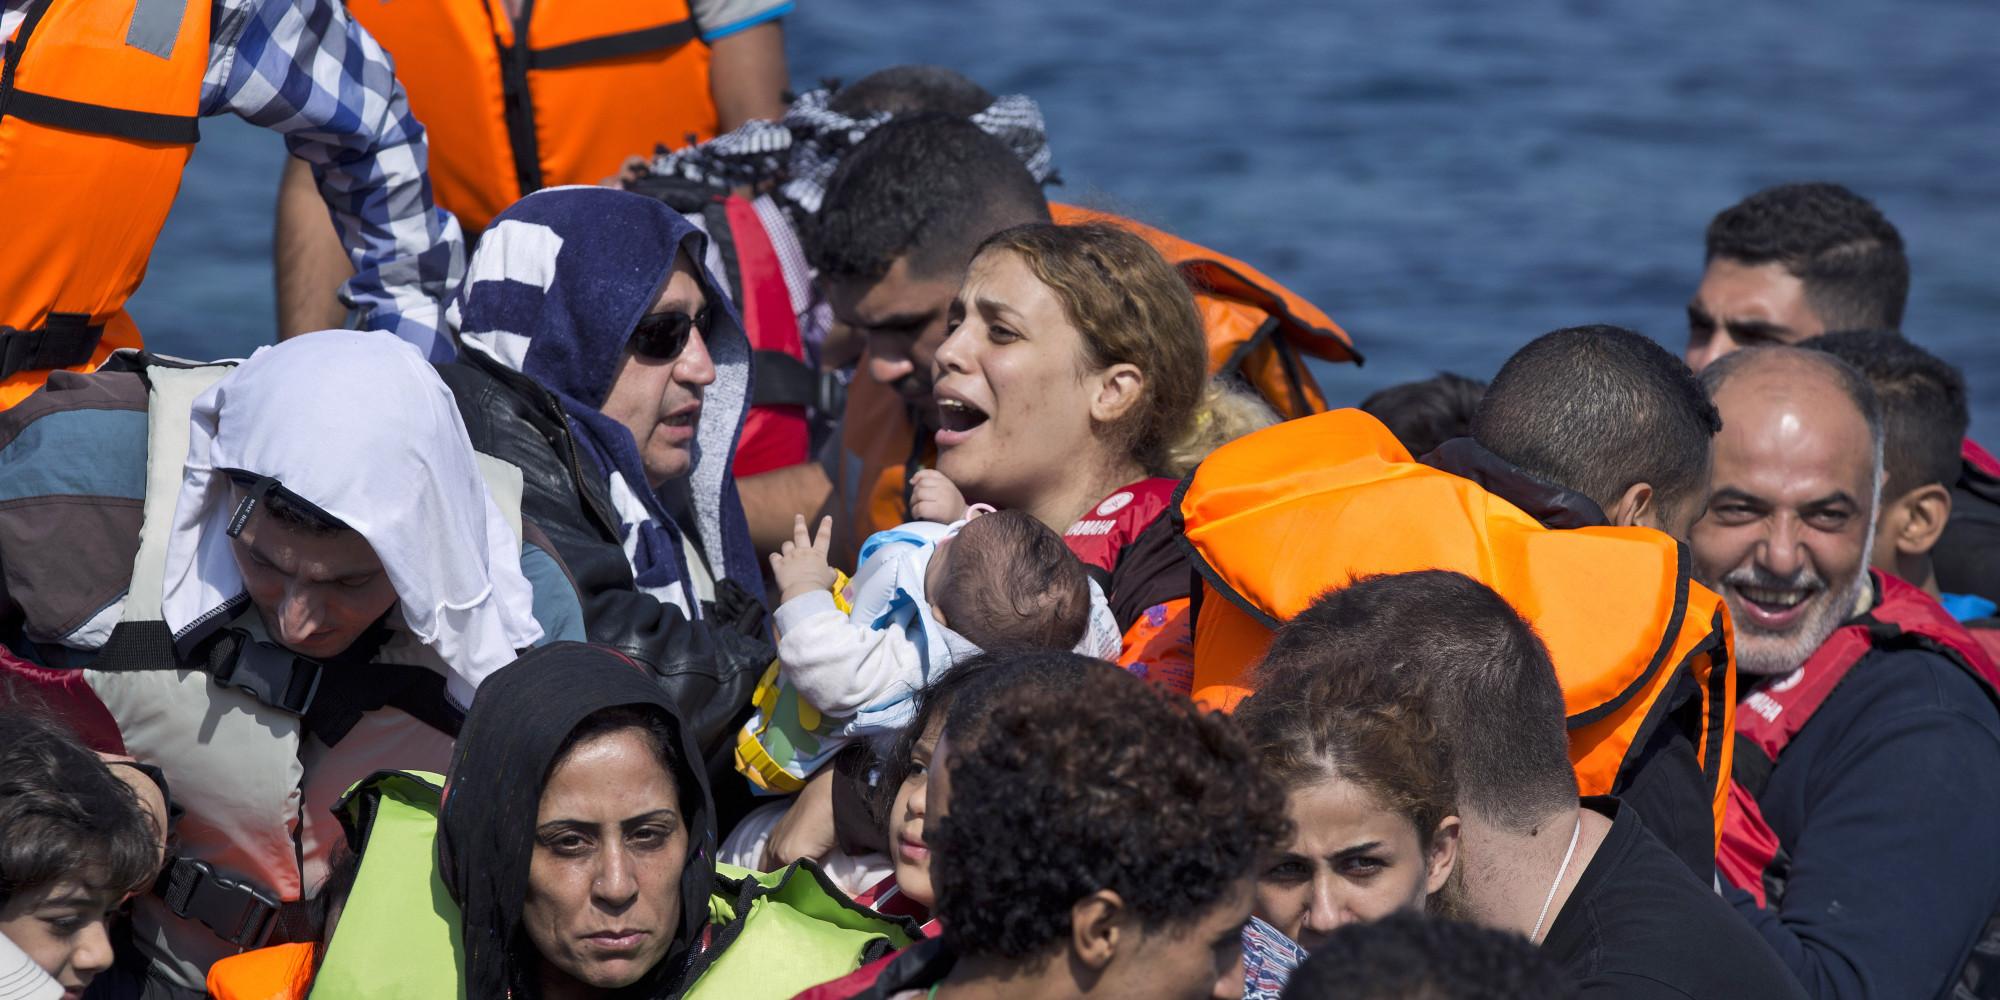 Christian Nation, Syrian refugees